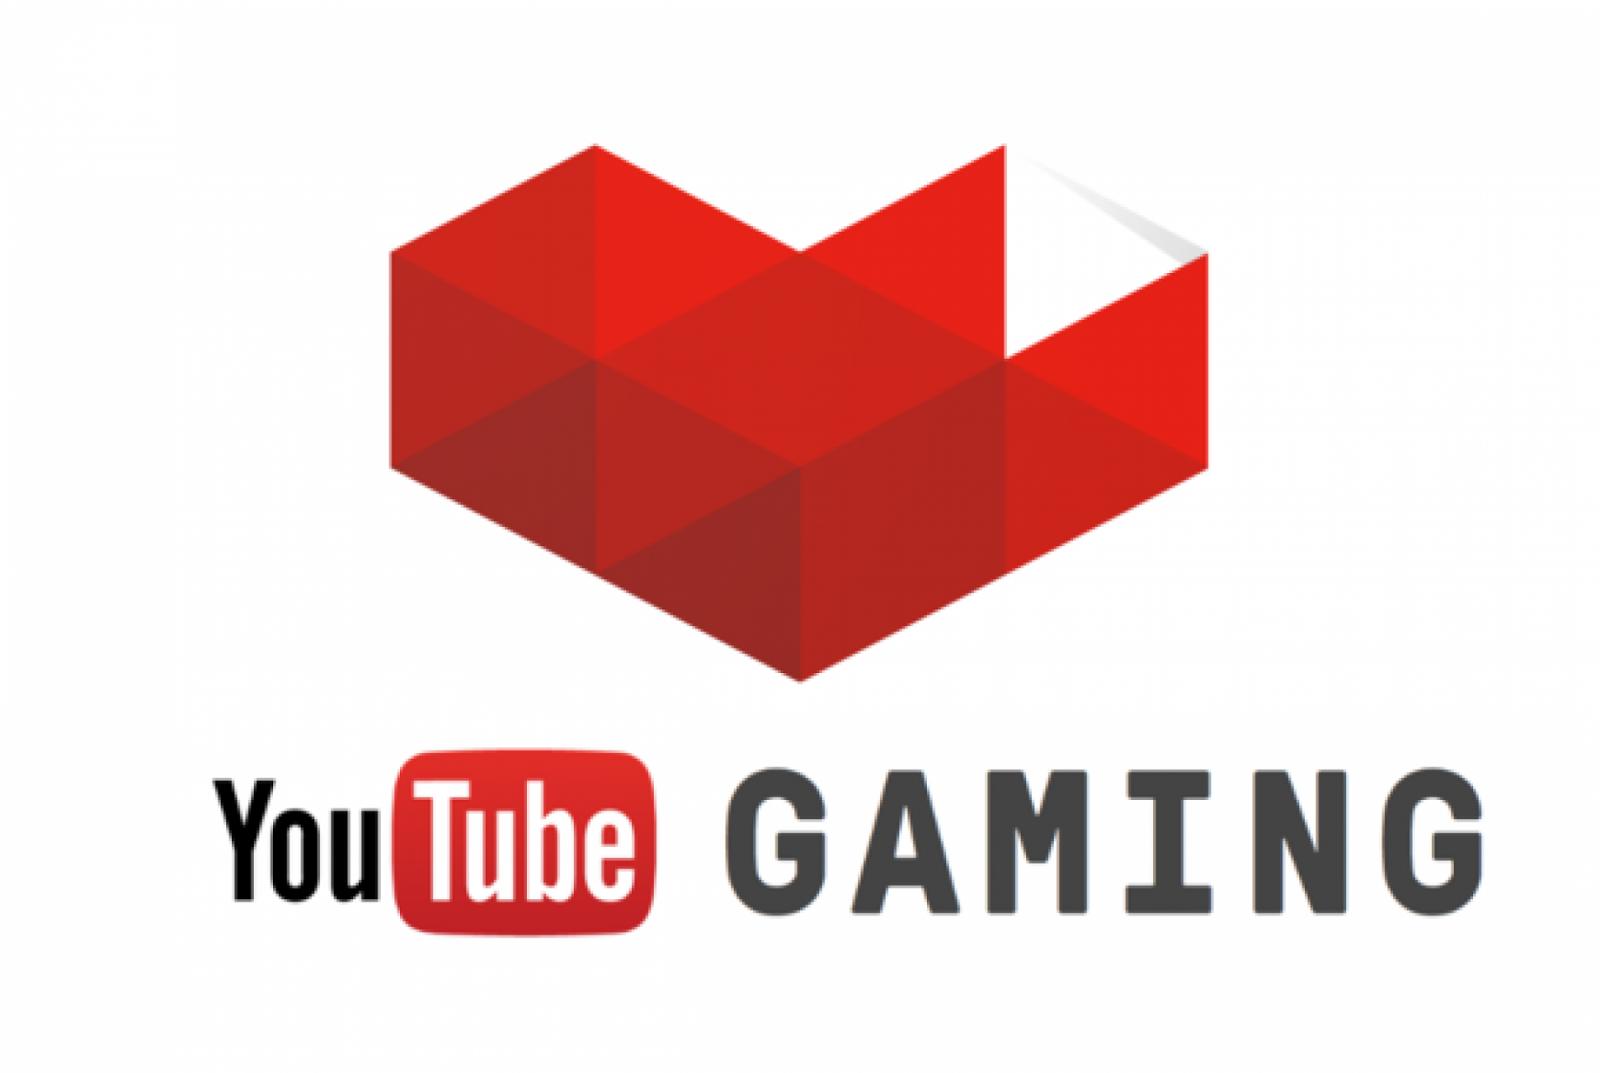 02fcb12d5 حصل تطبيقYoutube Gaming بث الألعاب على تحديث جديد على أجهزة نظام أندرويد  حيث جلب معه دعما كبيرا لنظارات الواقع الافتراضي من cardboard google